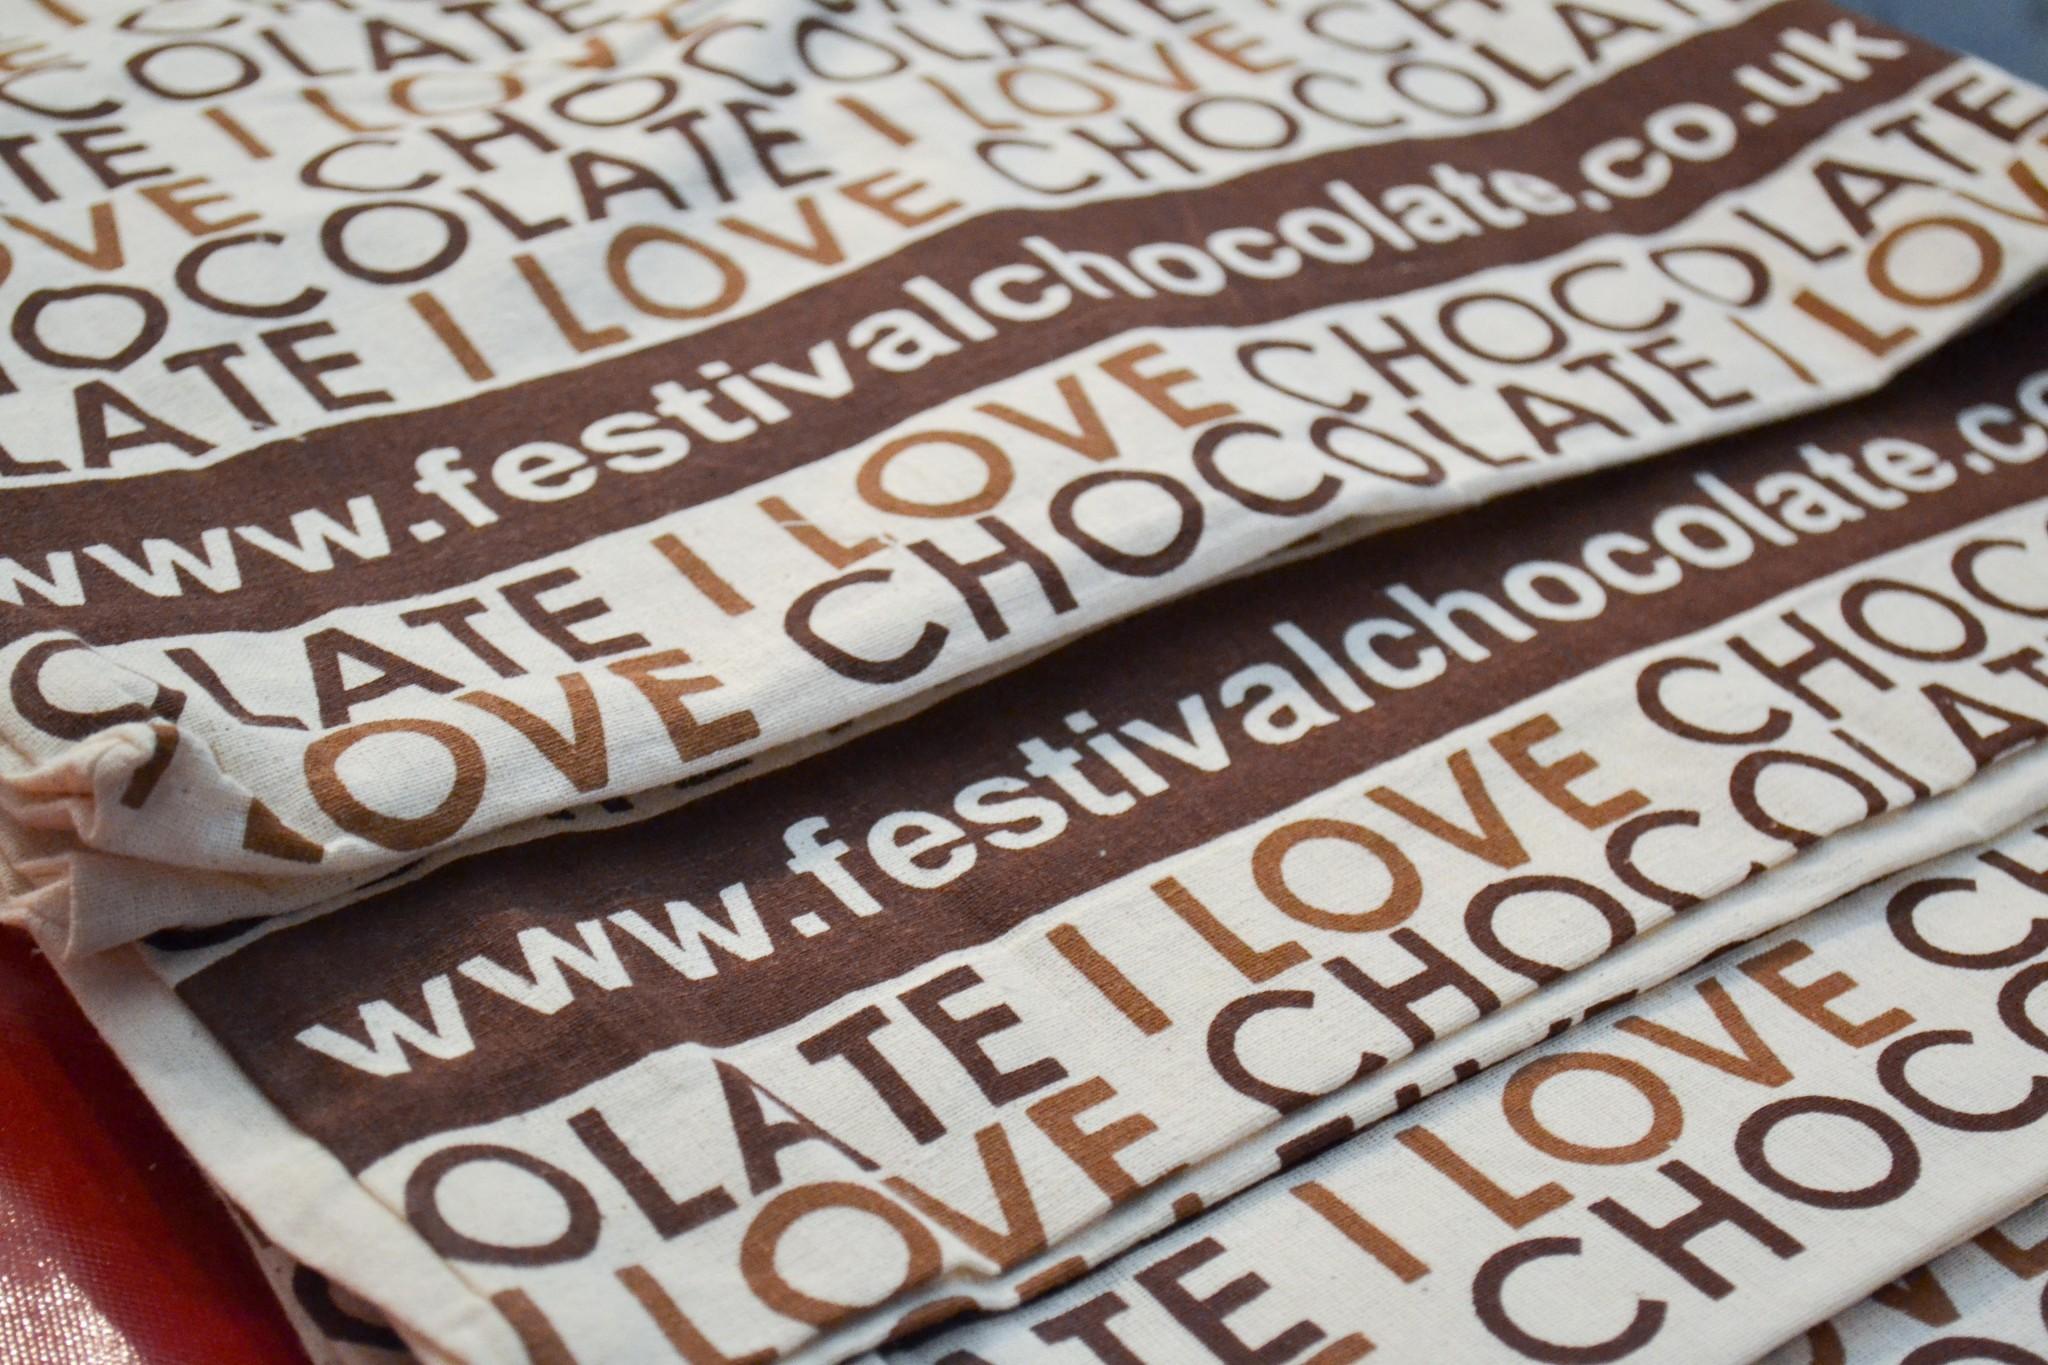 London Chocolate Festival Southbank 11 Dec 2011